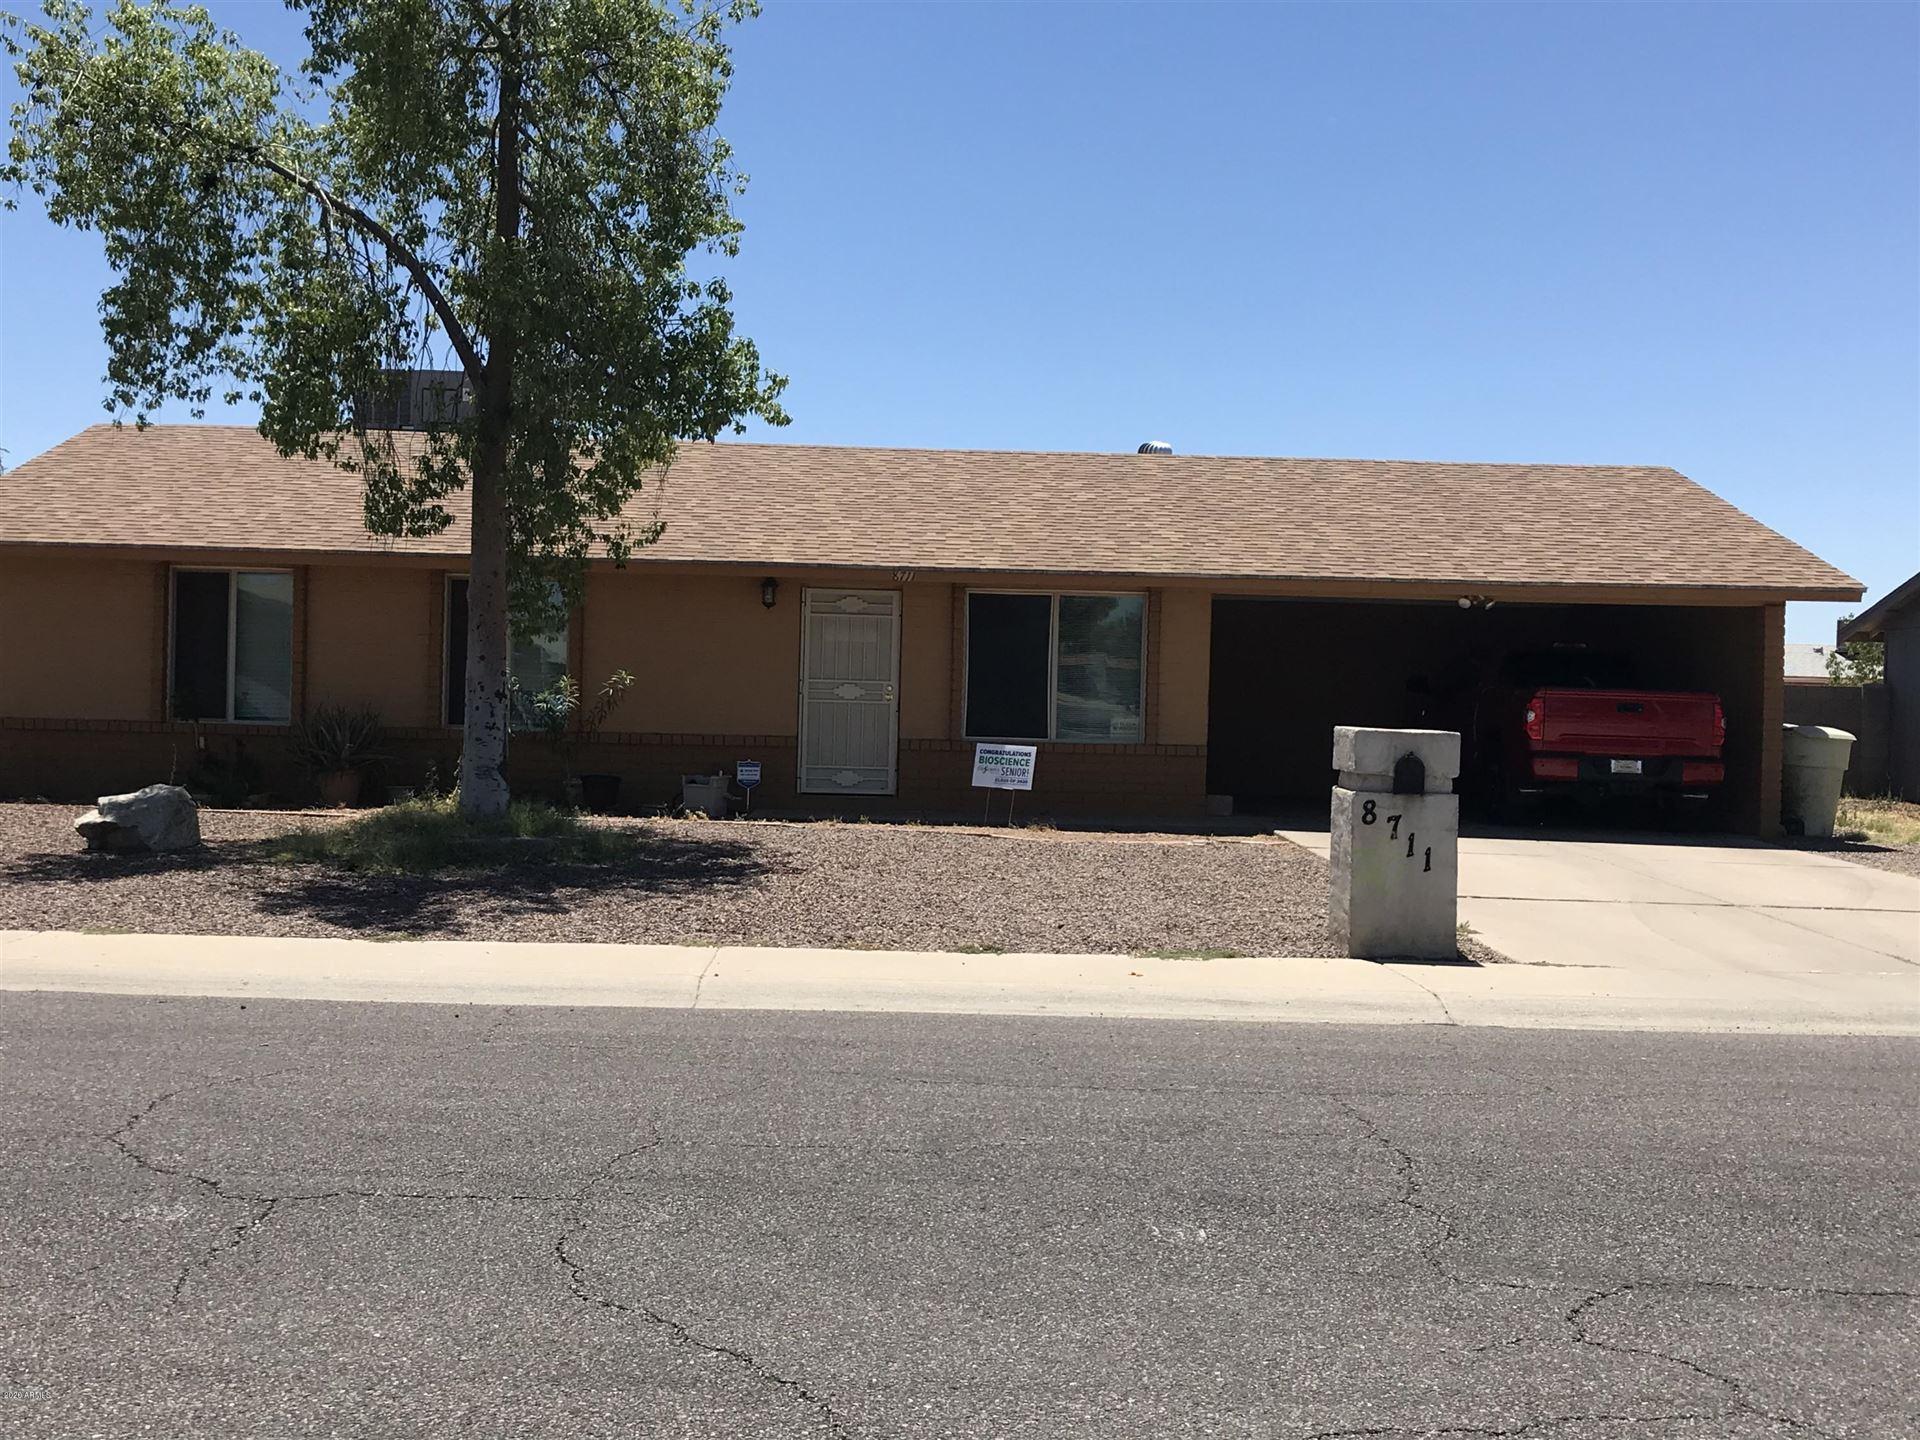 8711 W FLOWER Street, Phoenix, AZ 85037 - MLS#: 6089779